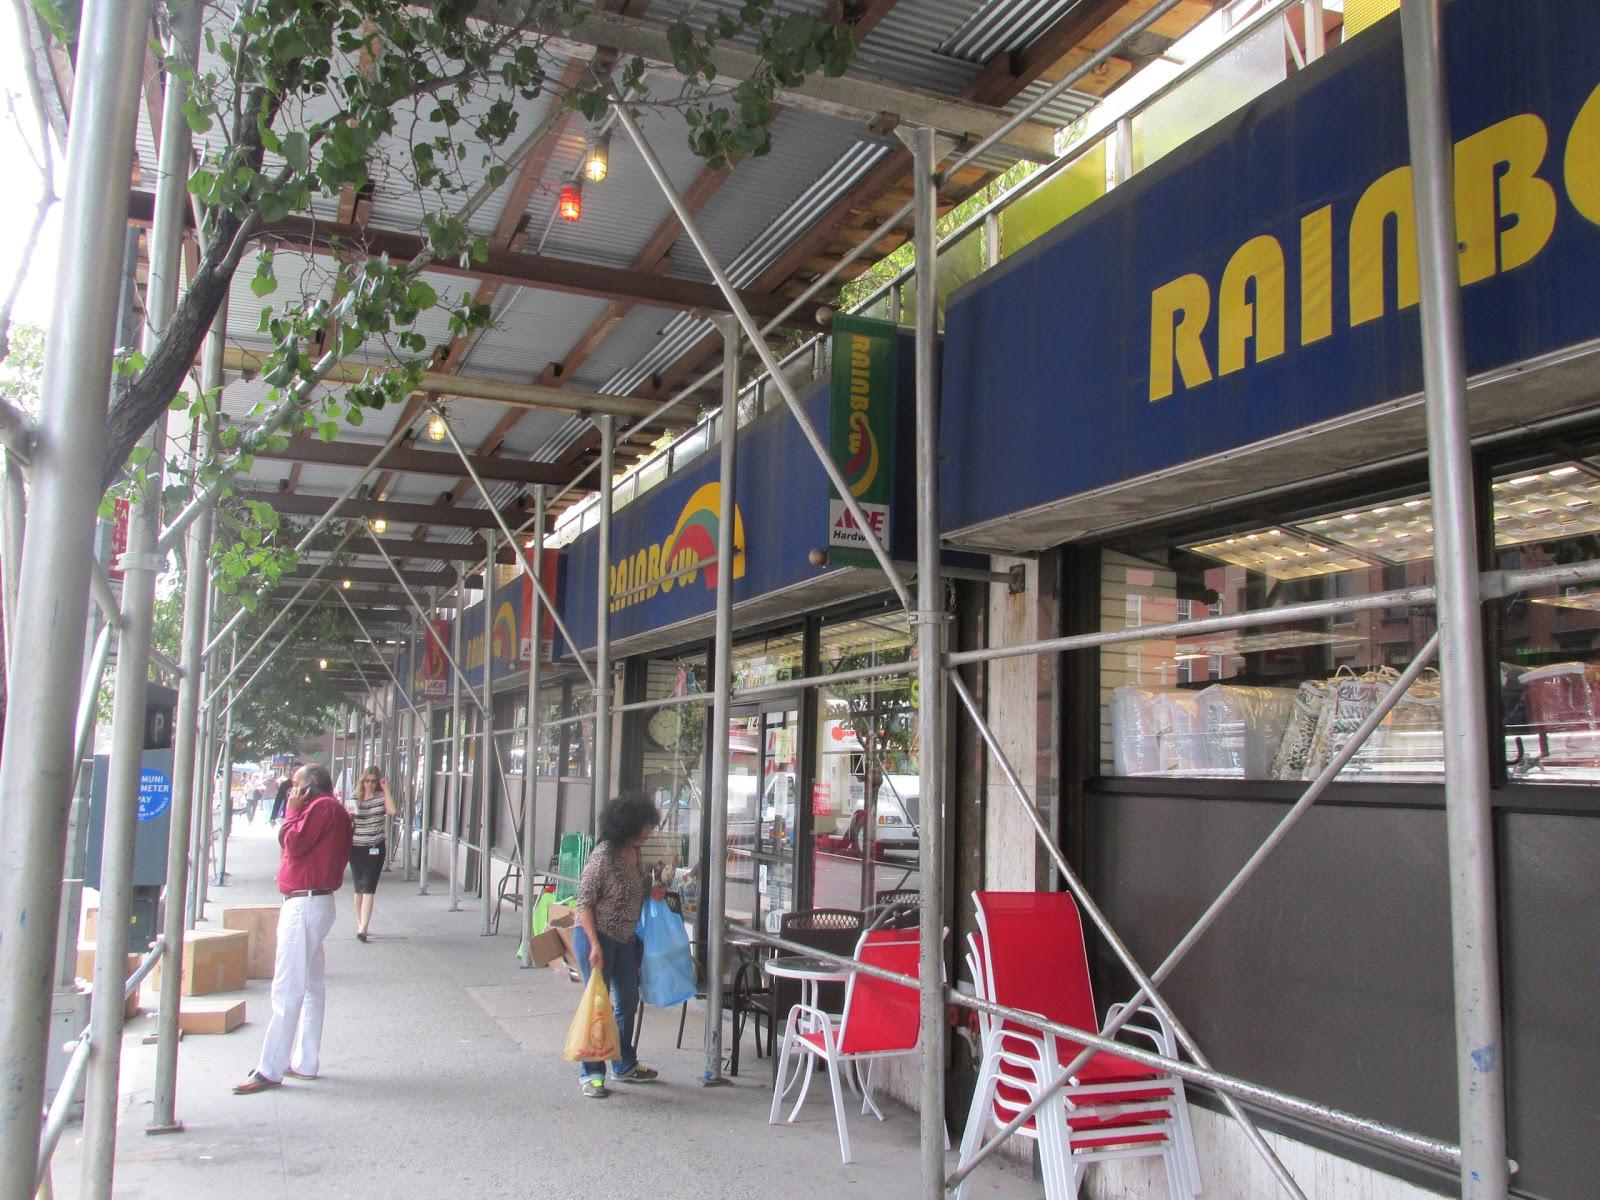 Rainbows clothing store